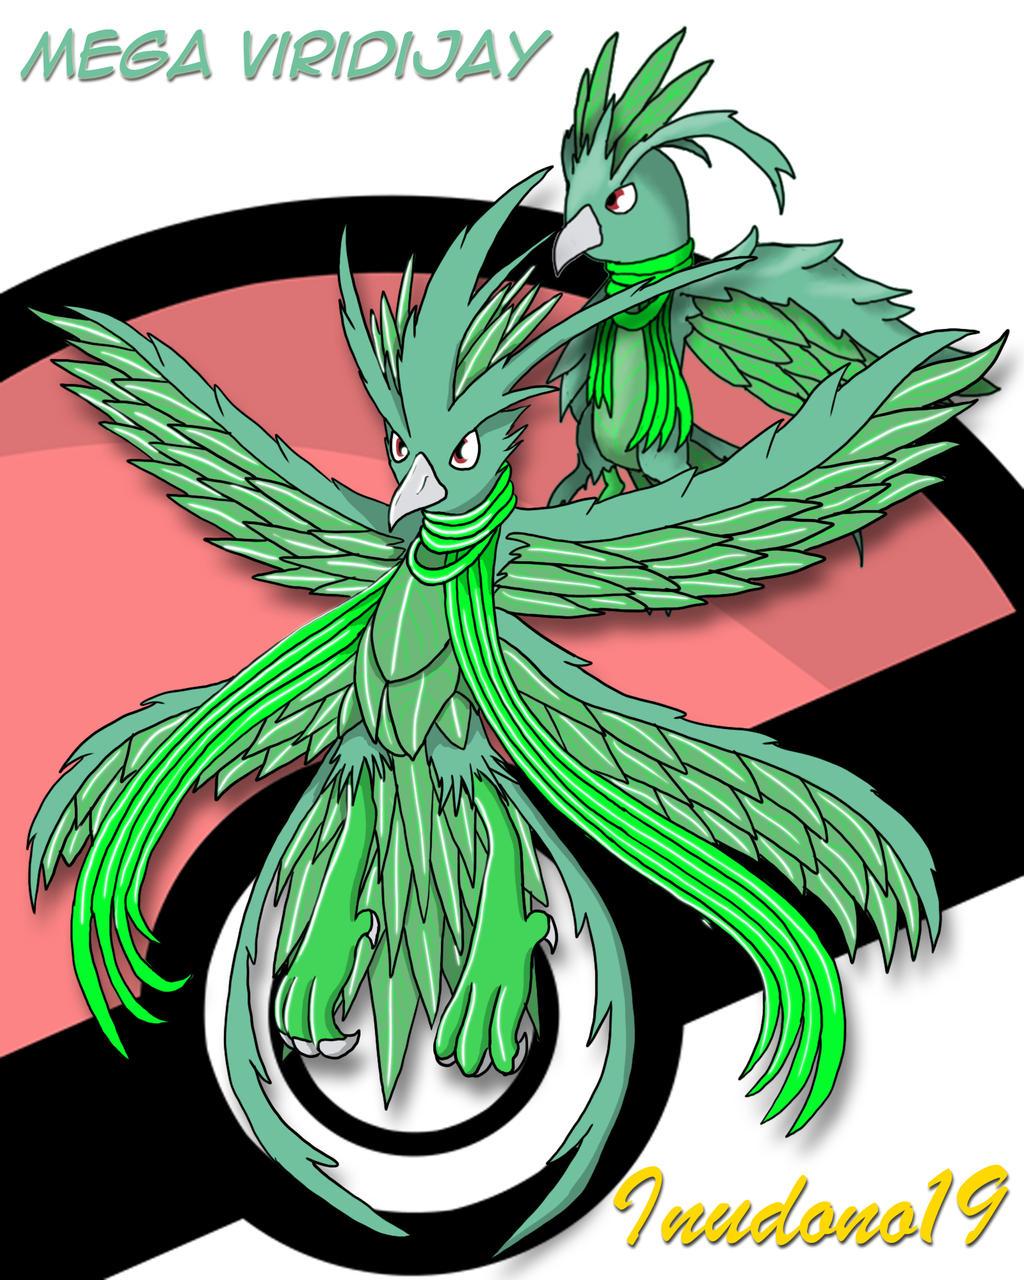 Fakemon 003 Mega Viridijay By Inudono19 On Deviantart